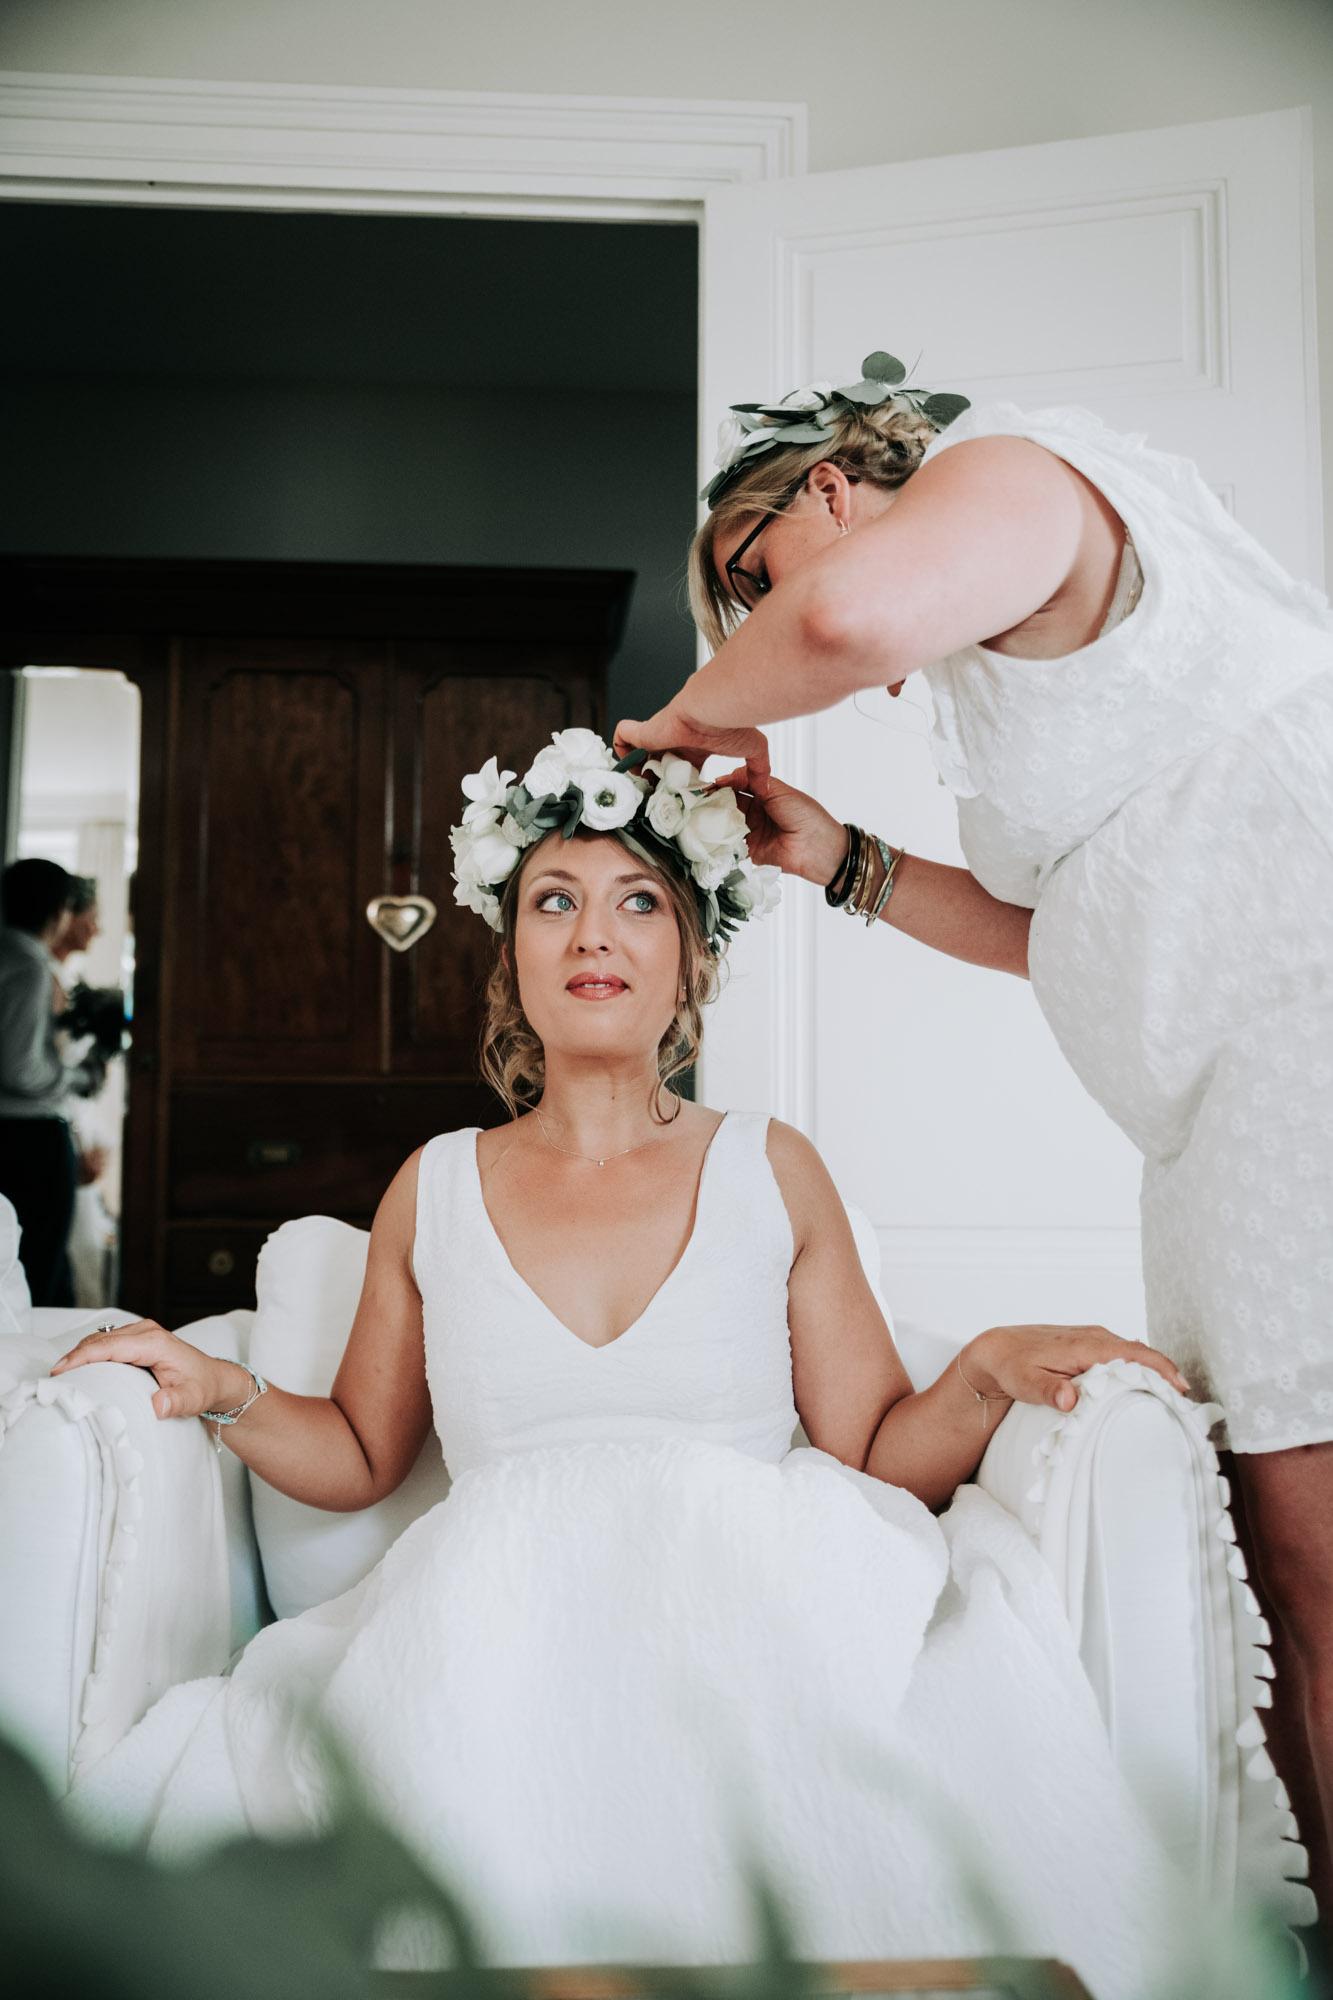 2018-07-21 - LD8_9676 - photographe mariage lyon - laurie diaz - www.lauriediazweeding.com.jpg